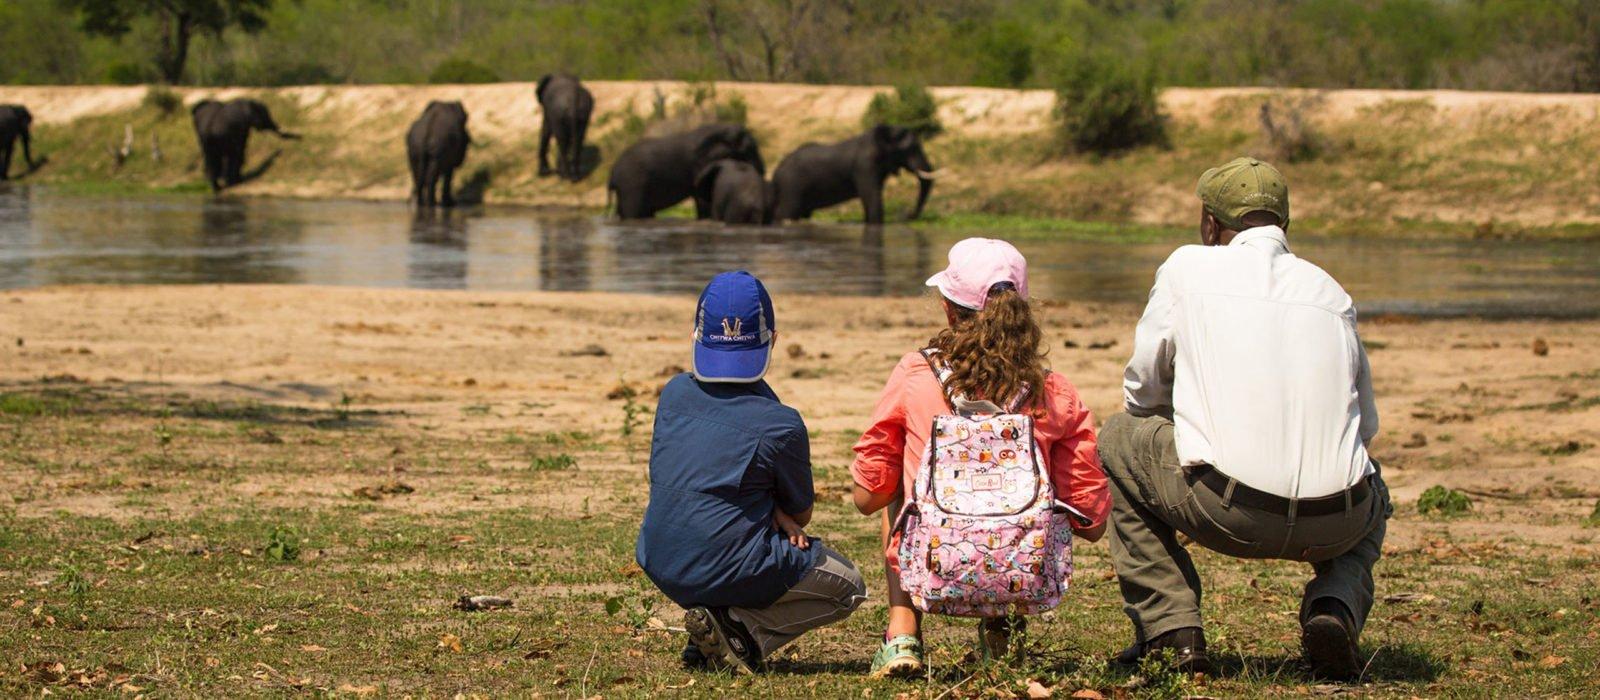 kids-animals-safari-chitwa-chitwa